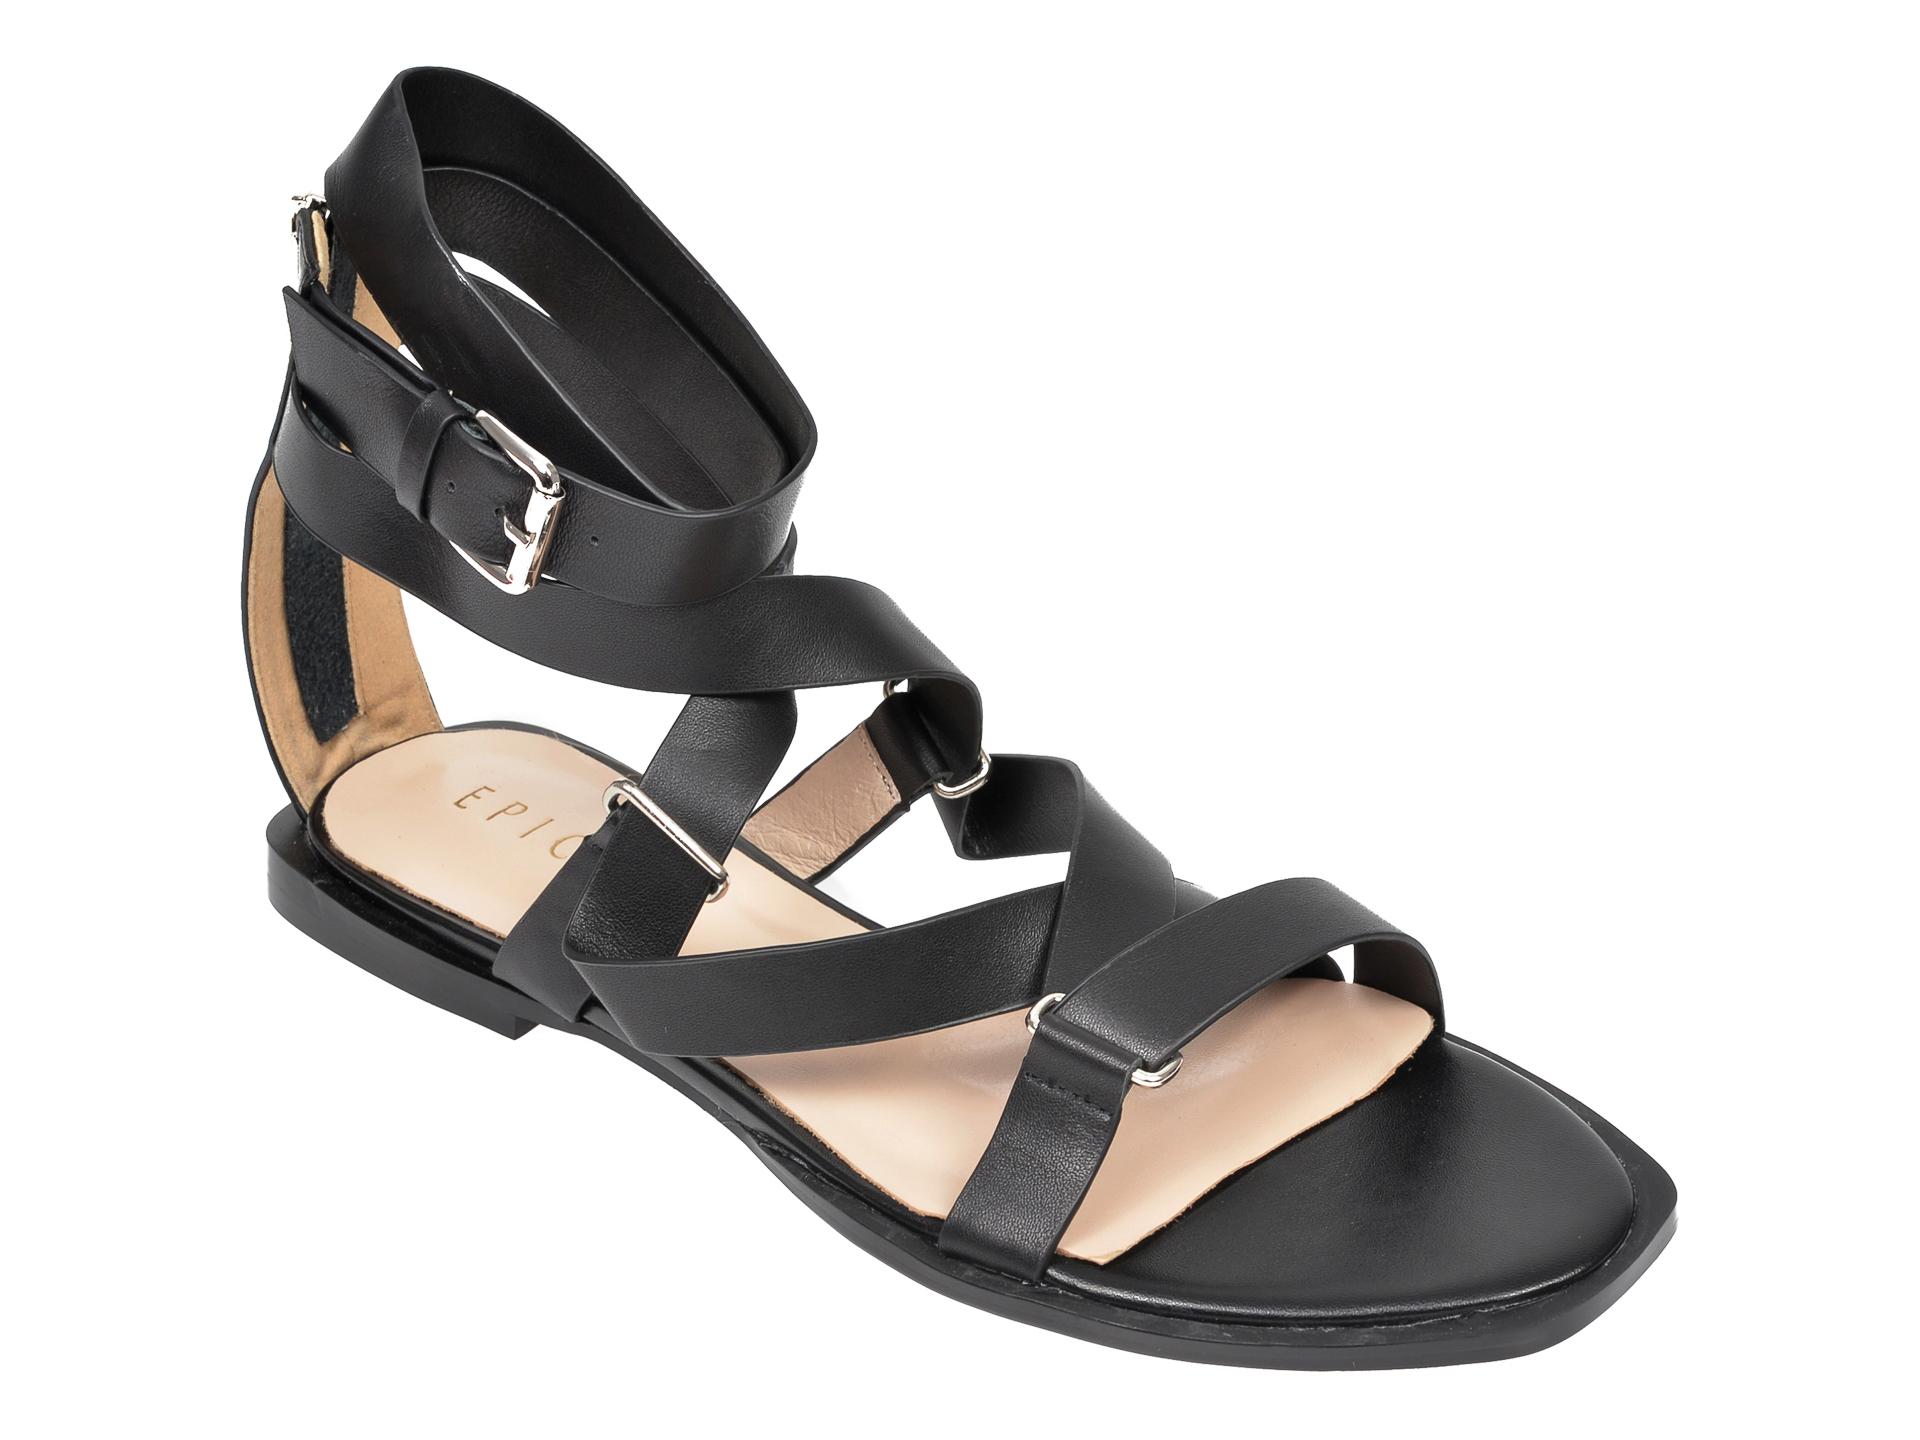 Sandale EPICA negre, NW9828N, din piele naturala imagine